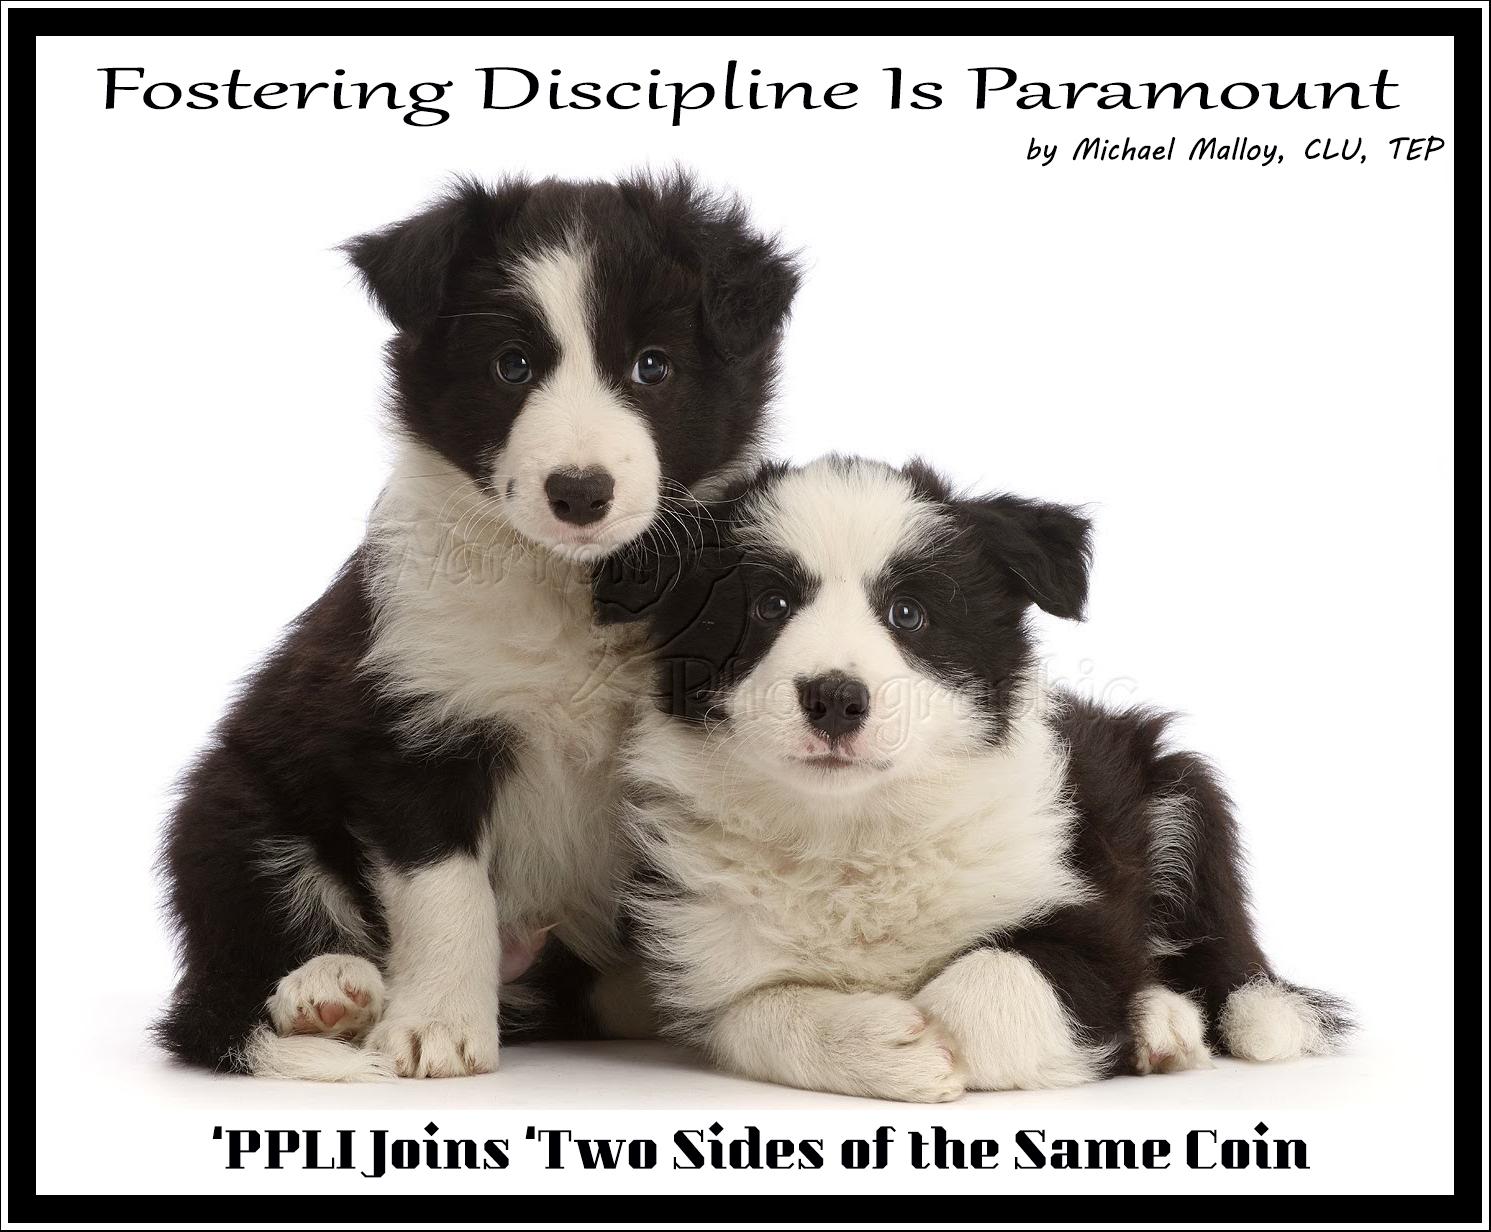 Fostering Discipline Is Paramount